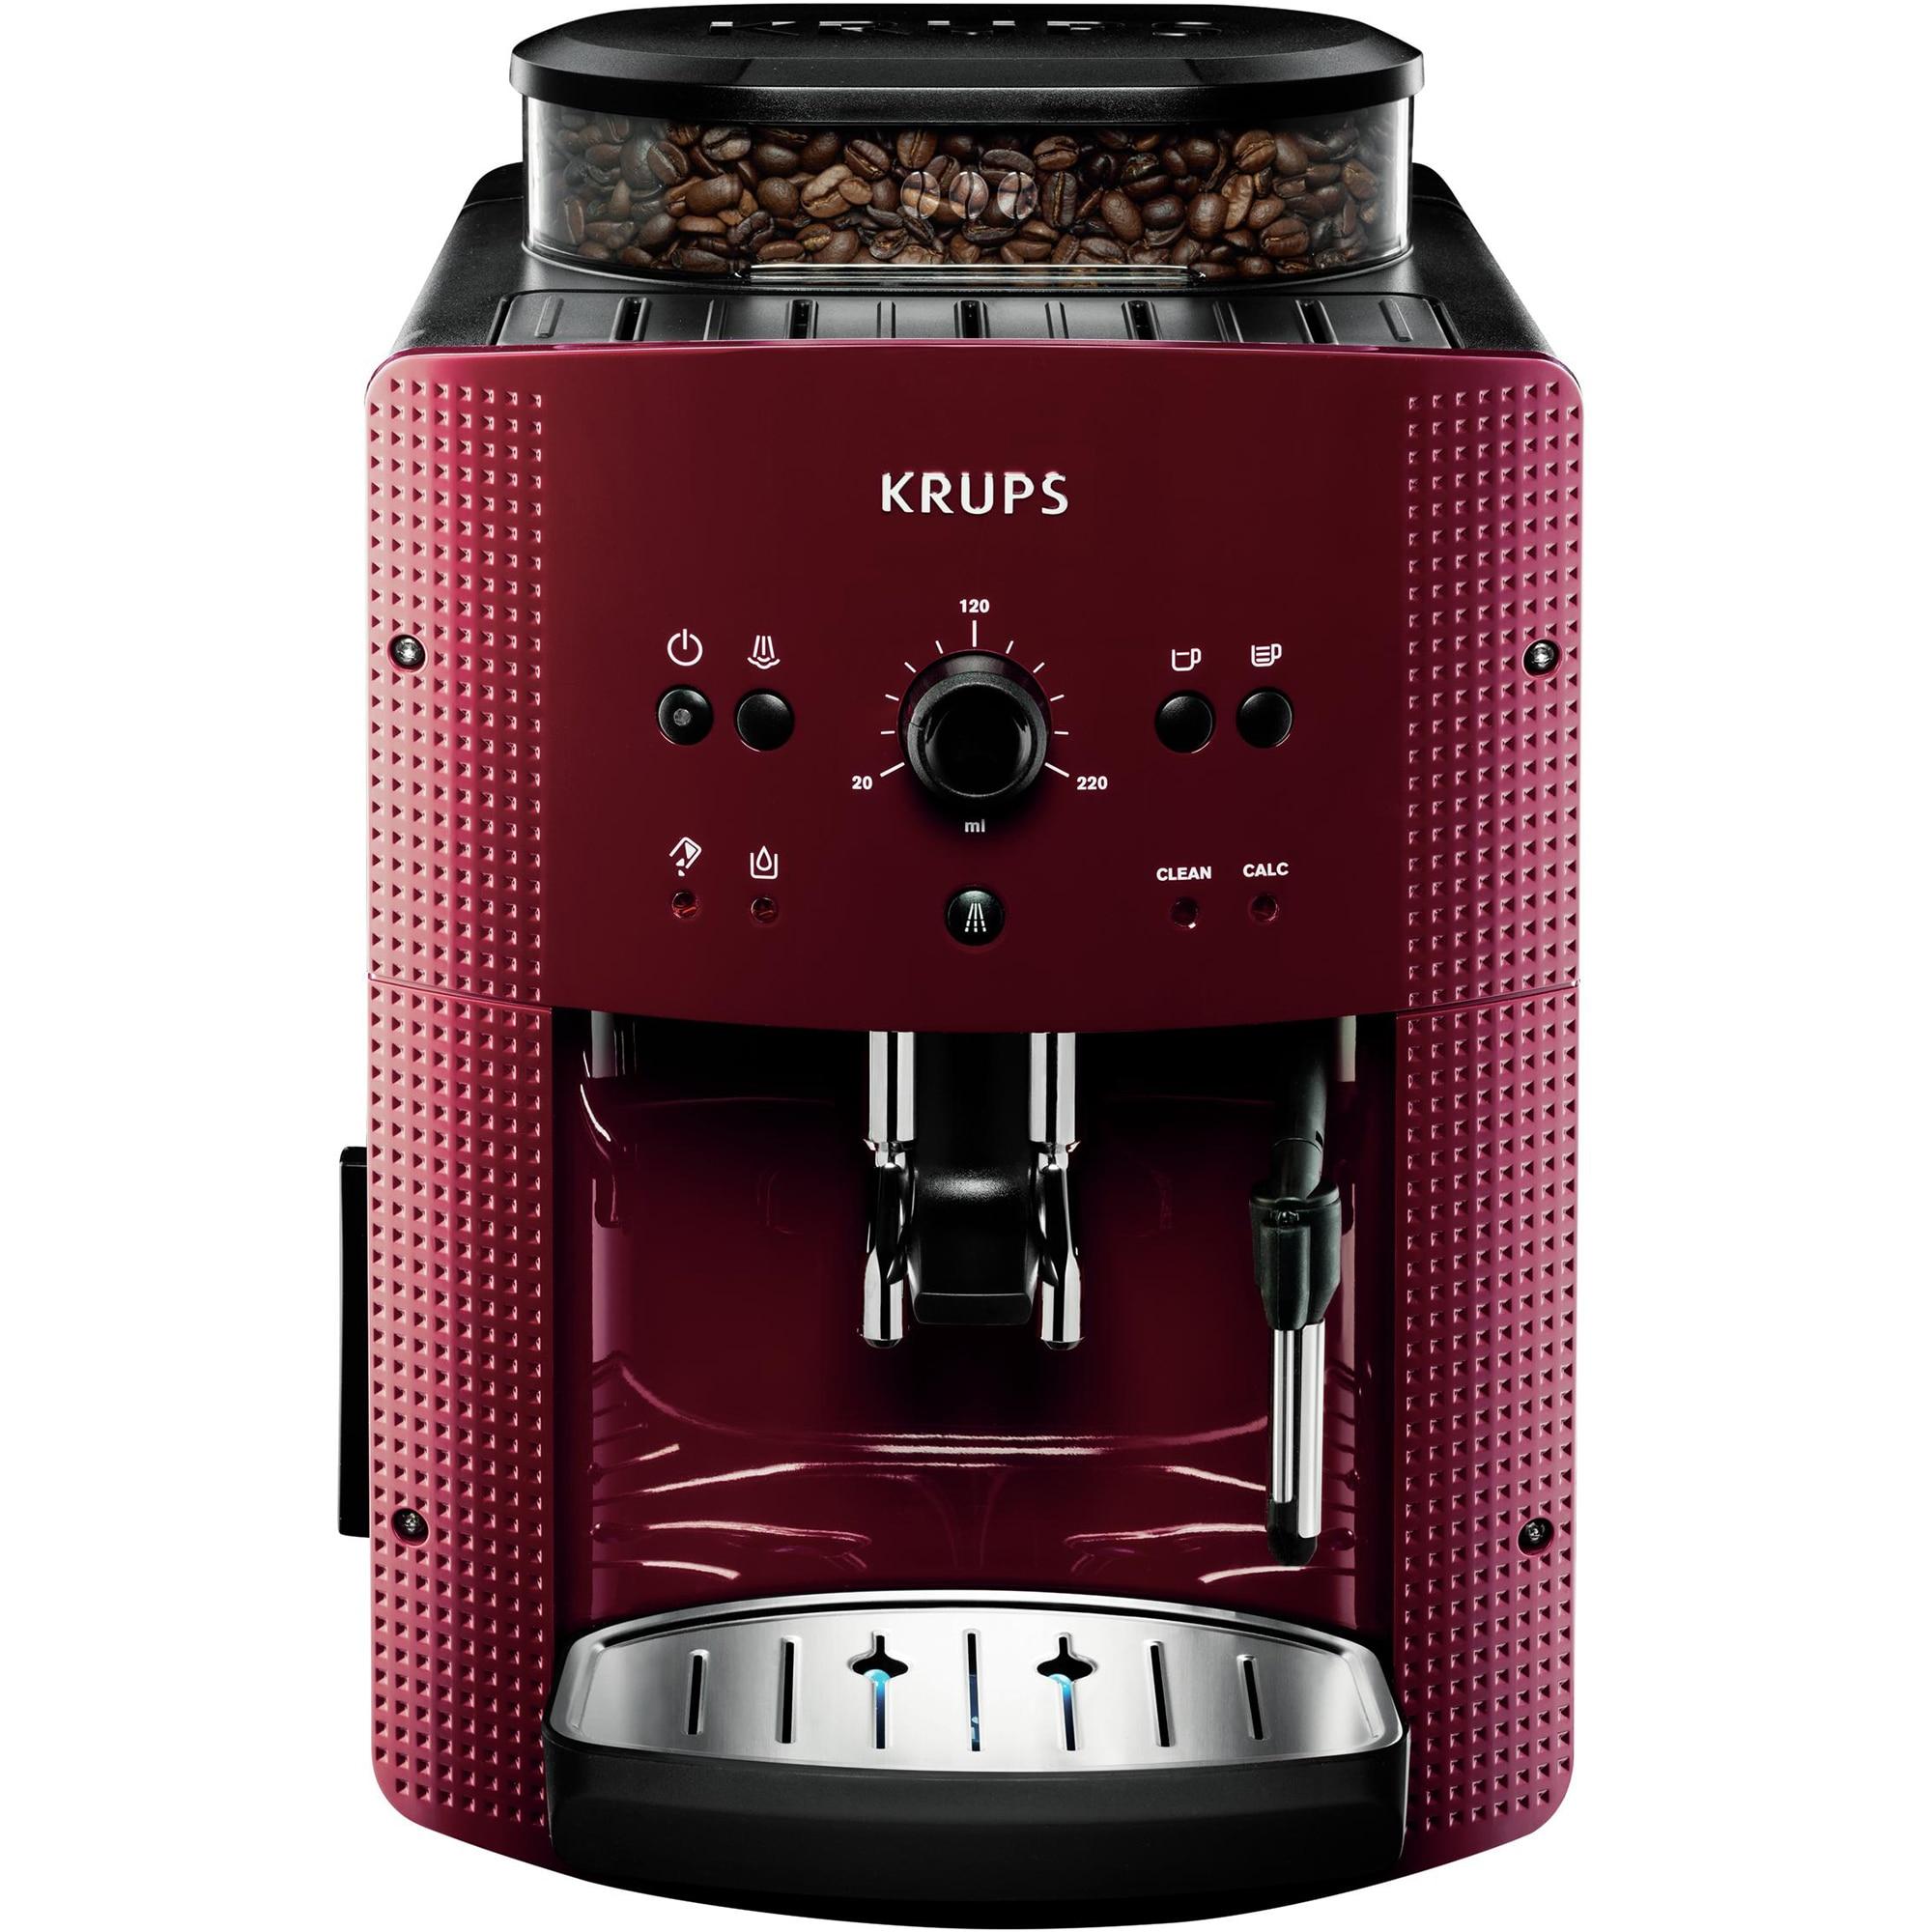 Fotografie Espressor automat Krups Espresseria Automatic EA810770, 1400W, 15 bar, rezervor boabe 260g, 1.7 l, Rosu